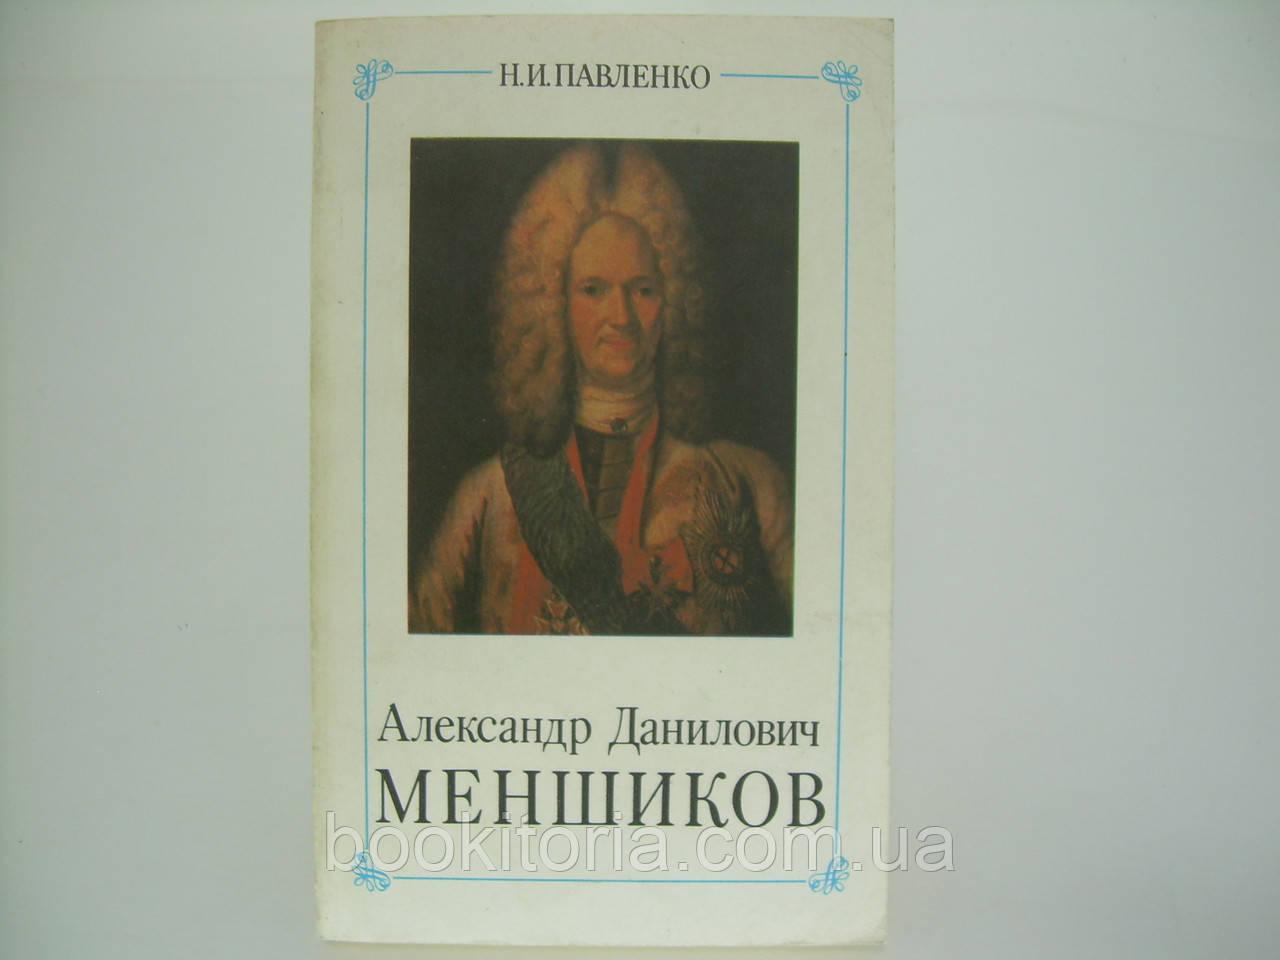 Павленко Н.И. Александр Данилови Меншиков (б/у).